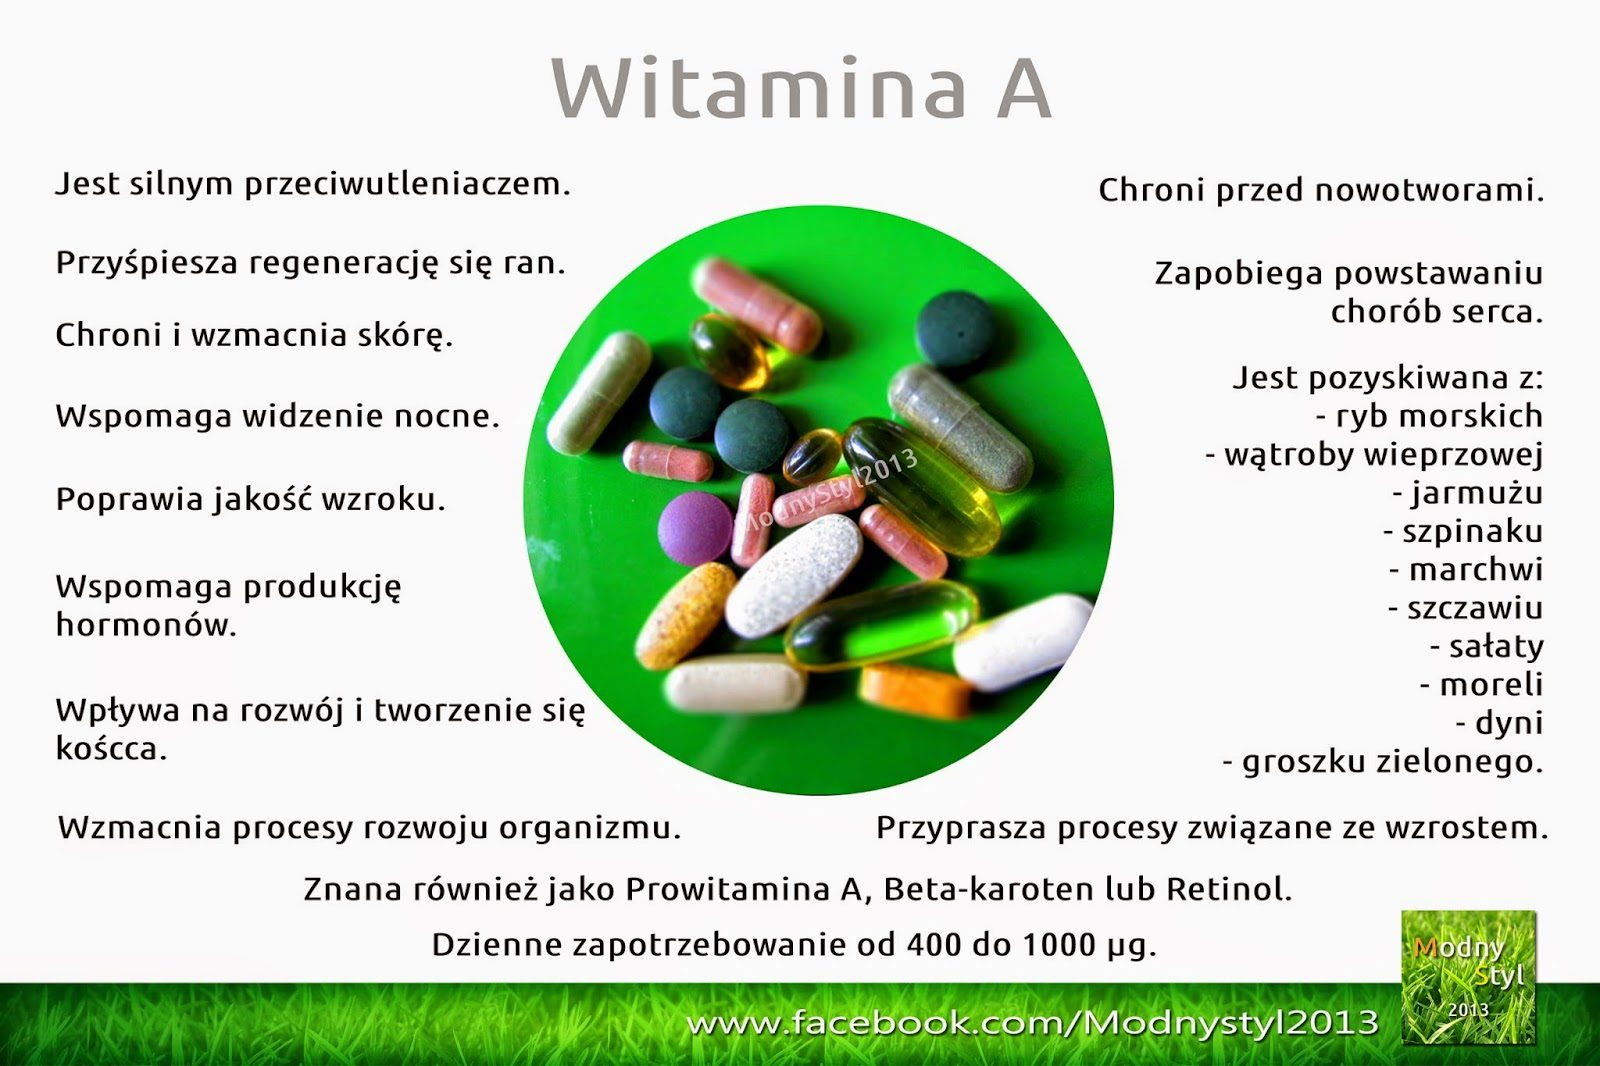 witamina2ba-4091747